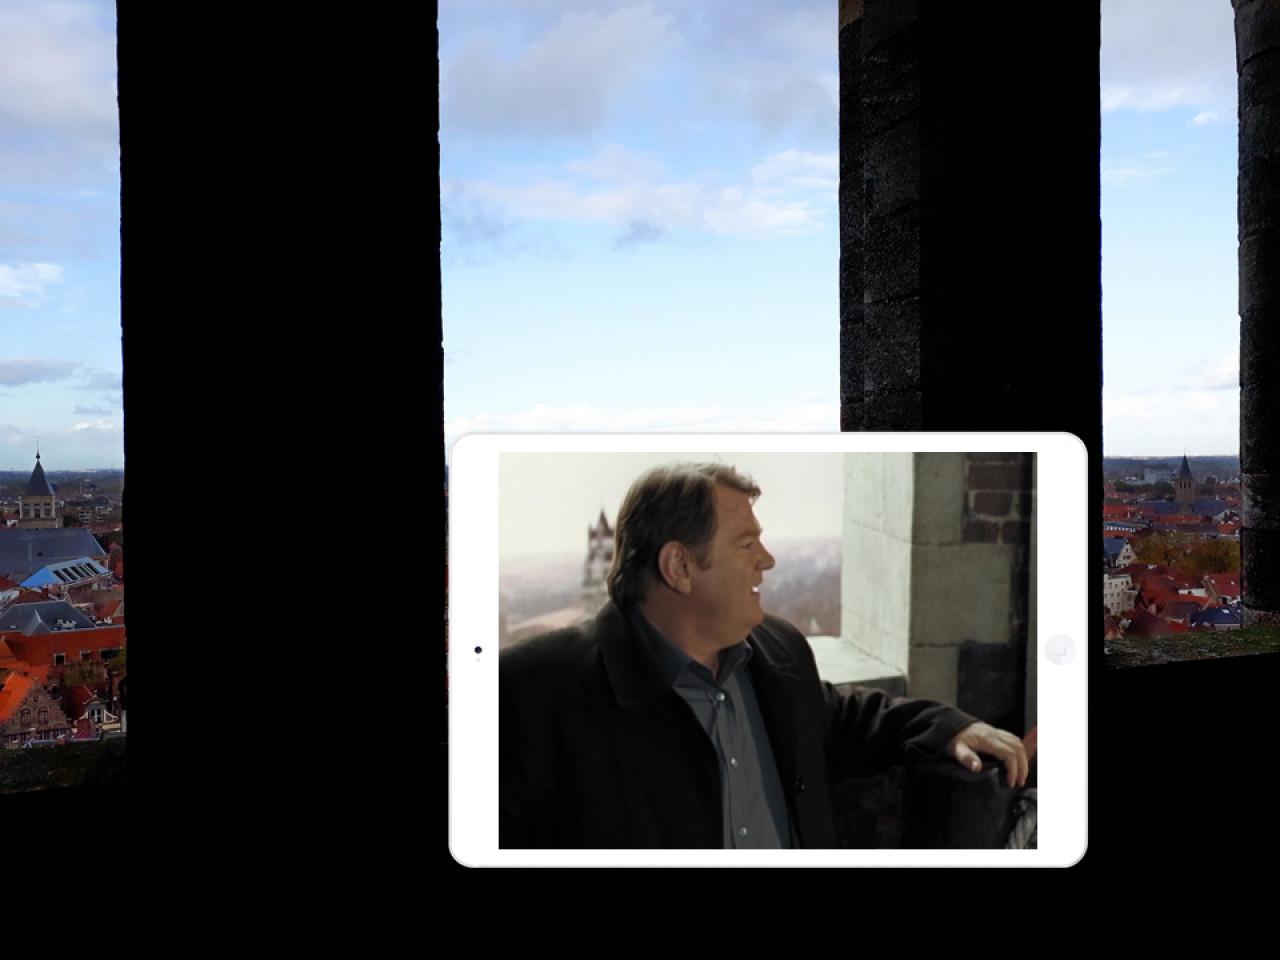 While Ken admires the views...